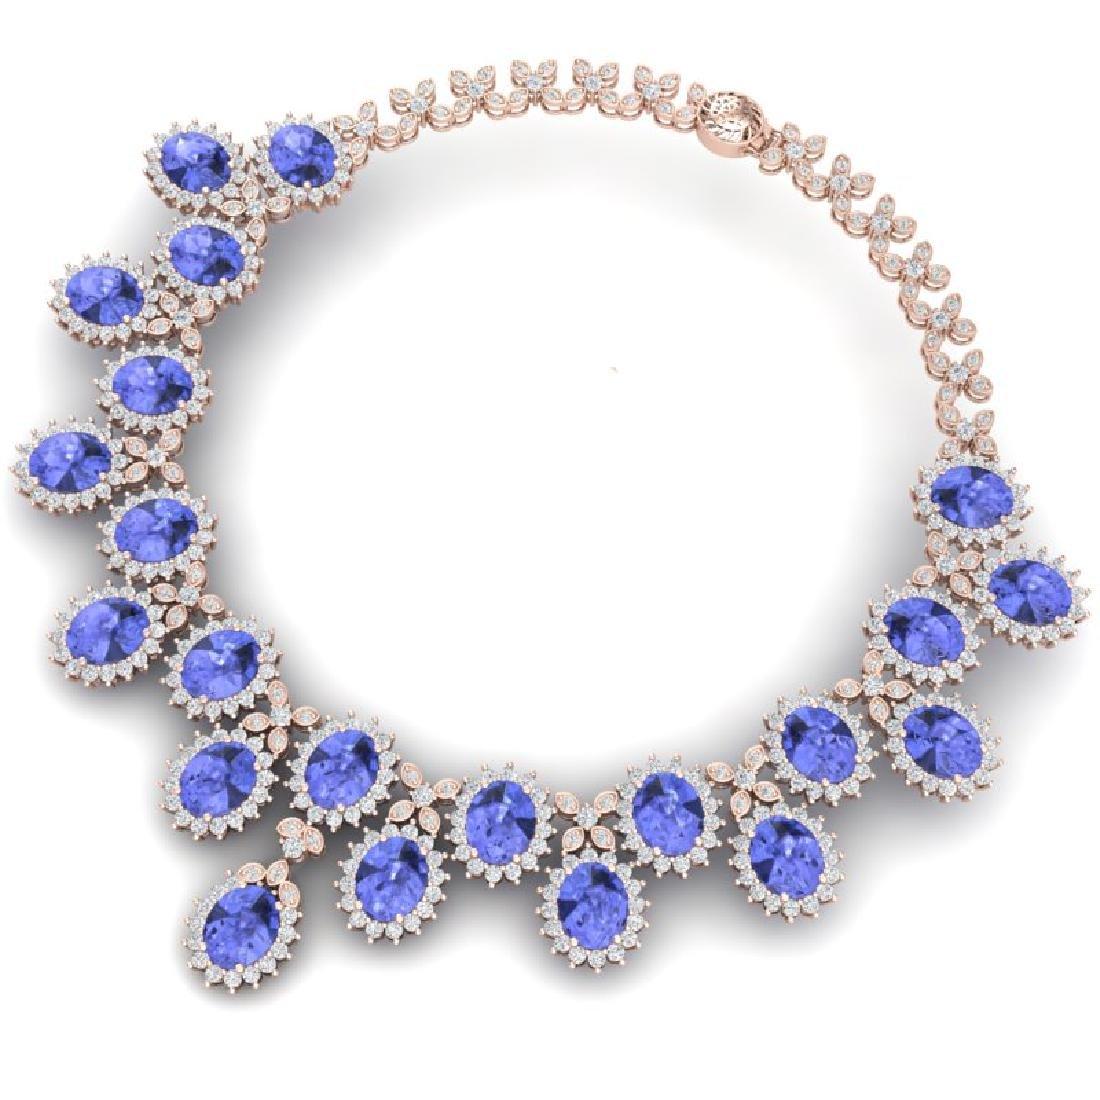 86 CTW Royalty Tanzanite & VS Diamond Necklace 18K Rose - 3